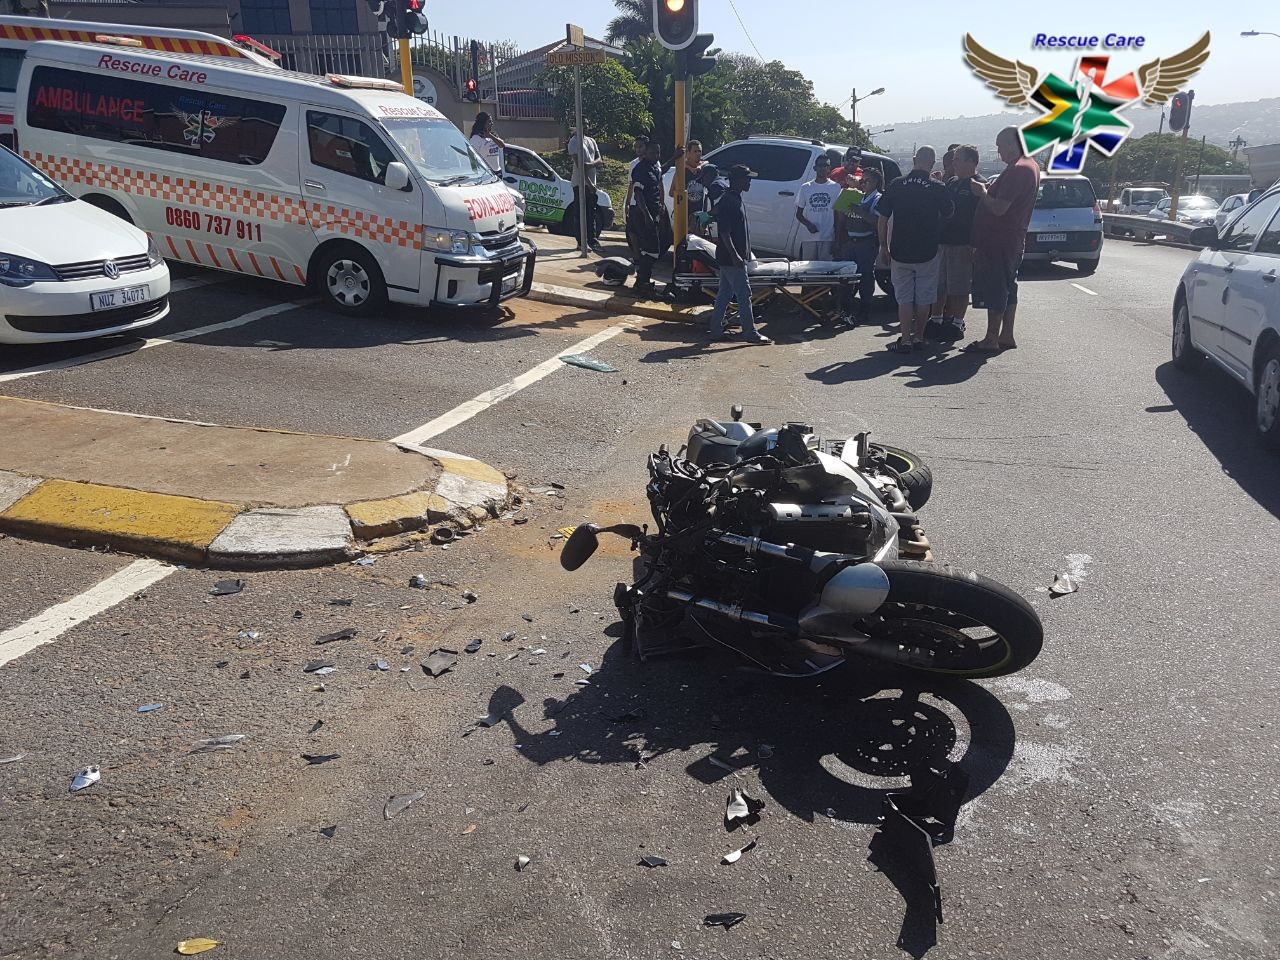 JUST IN Biker injured in Bluff Road crash